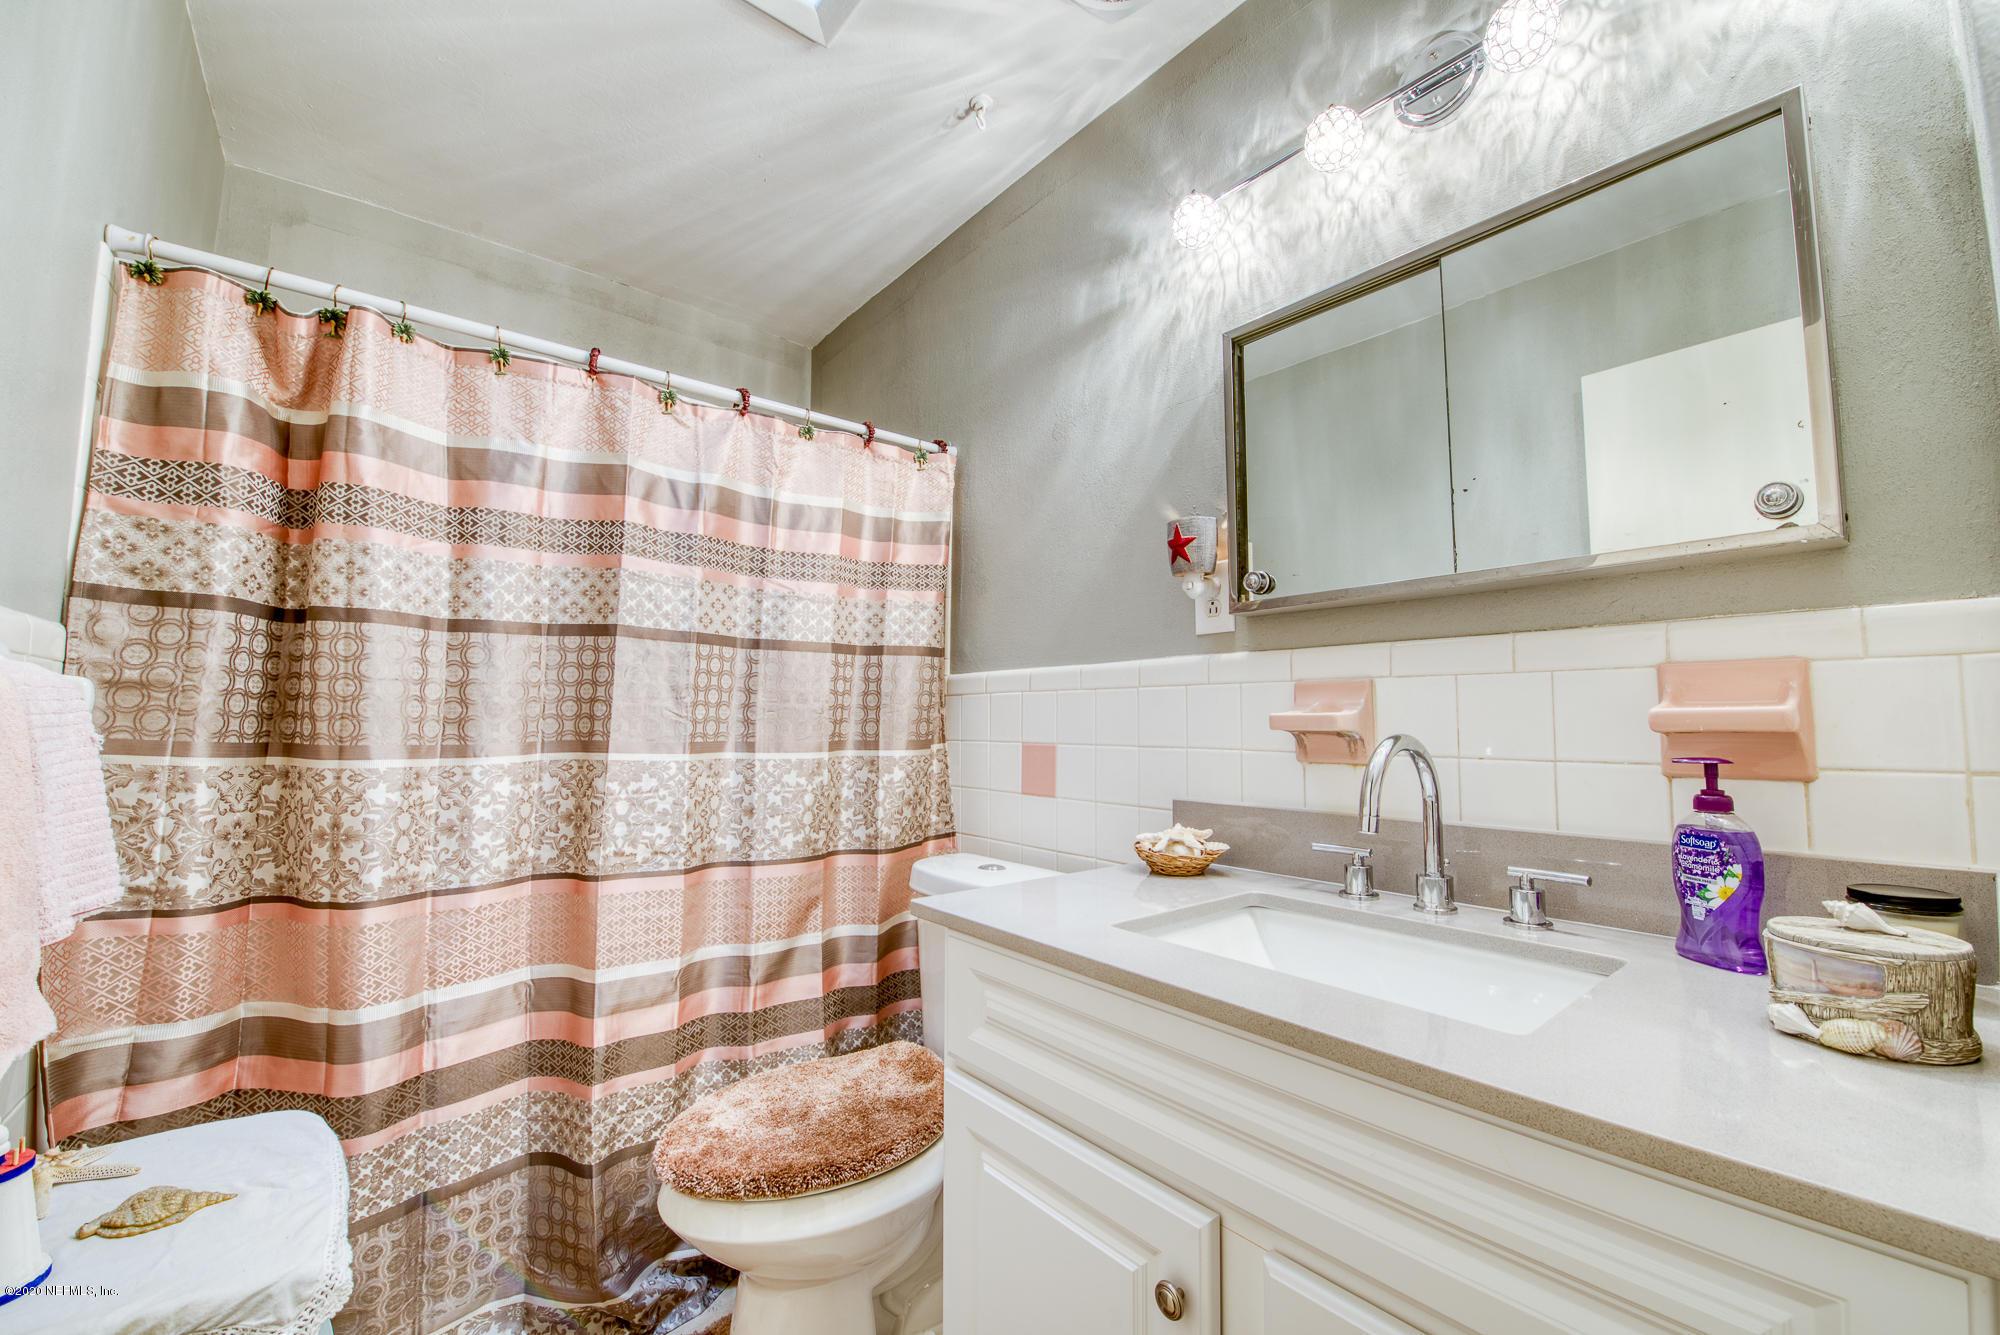 2335 BREST, JACKSONVILLE, FLORIDA 32216, 4 Bedrooms Bedrooms, ,2 BathroomsBathrooms,Residential,For sale,BREST,1079235